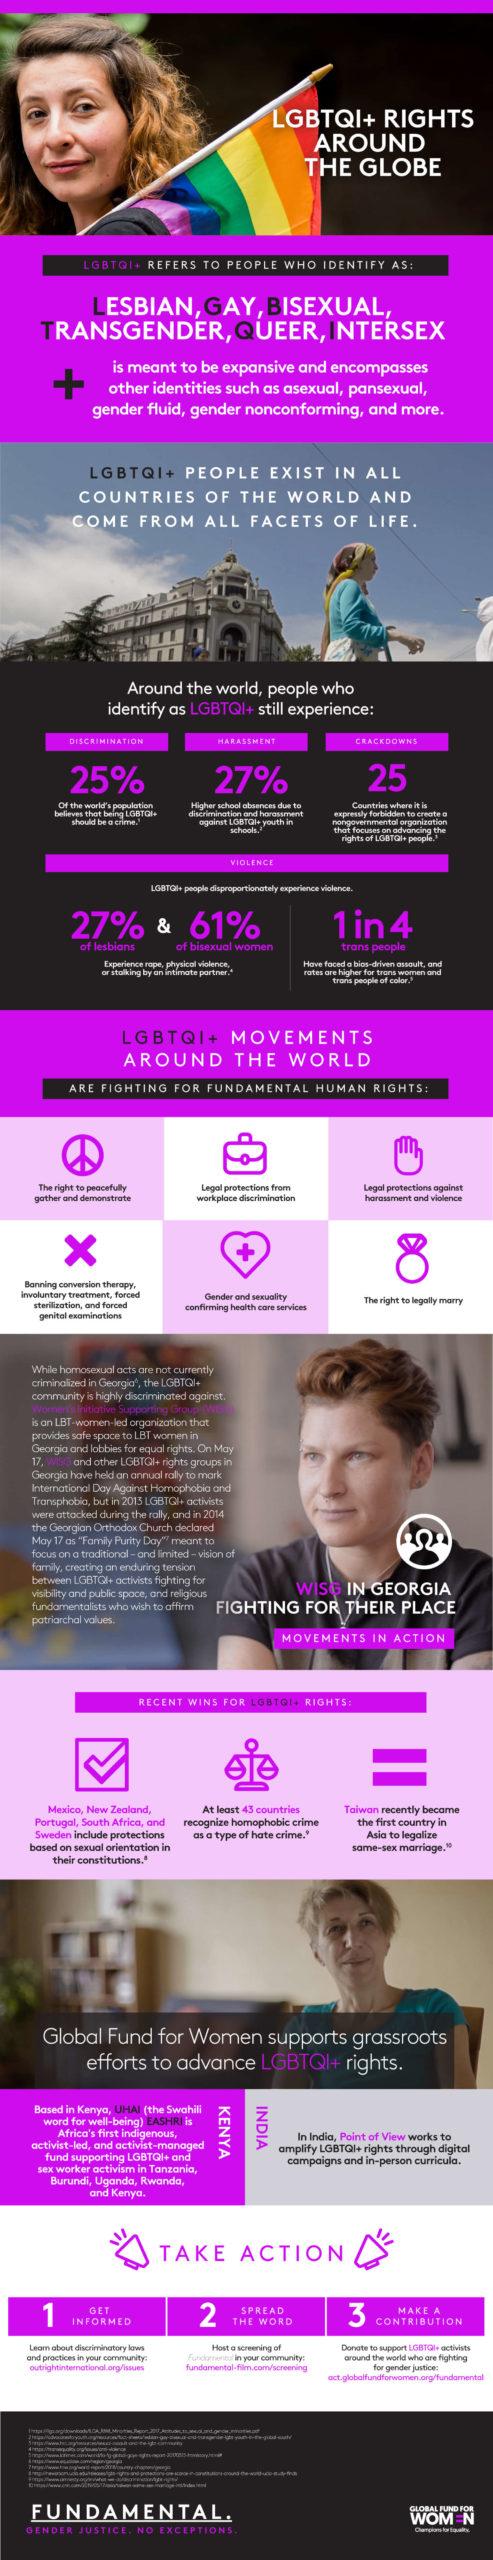 Fundamental-LGBTQI-RIghts-Around-World-infographic-full